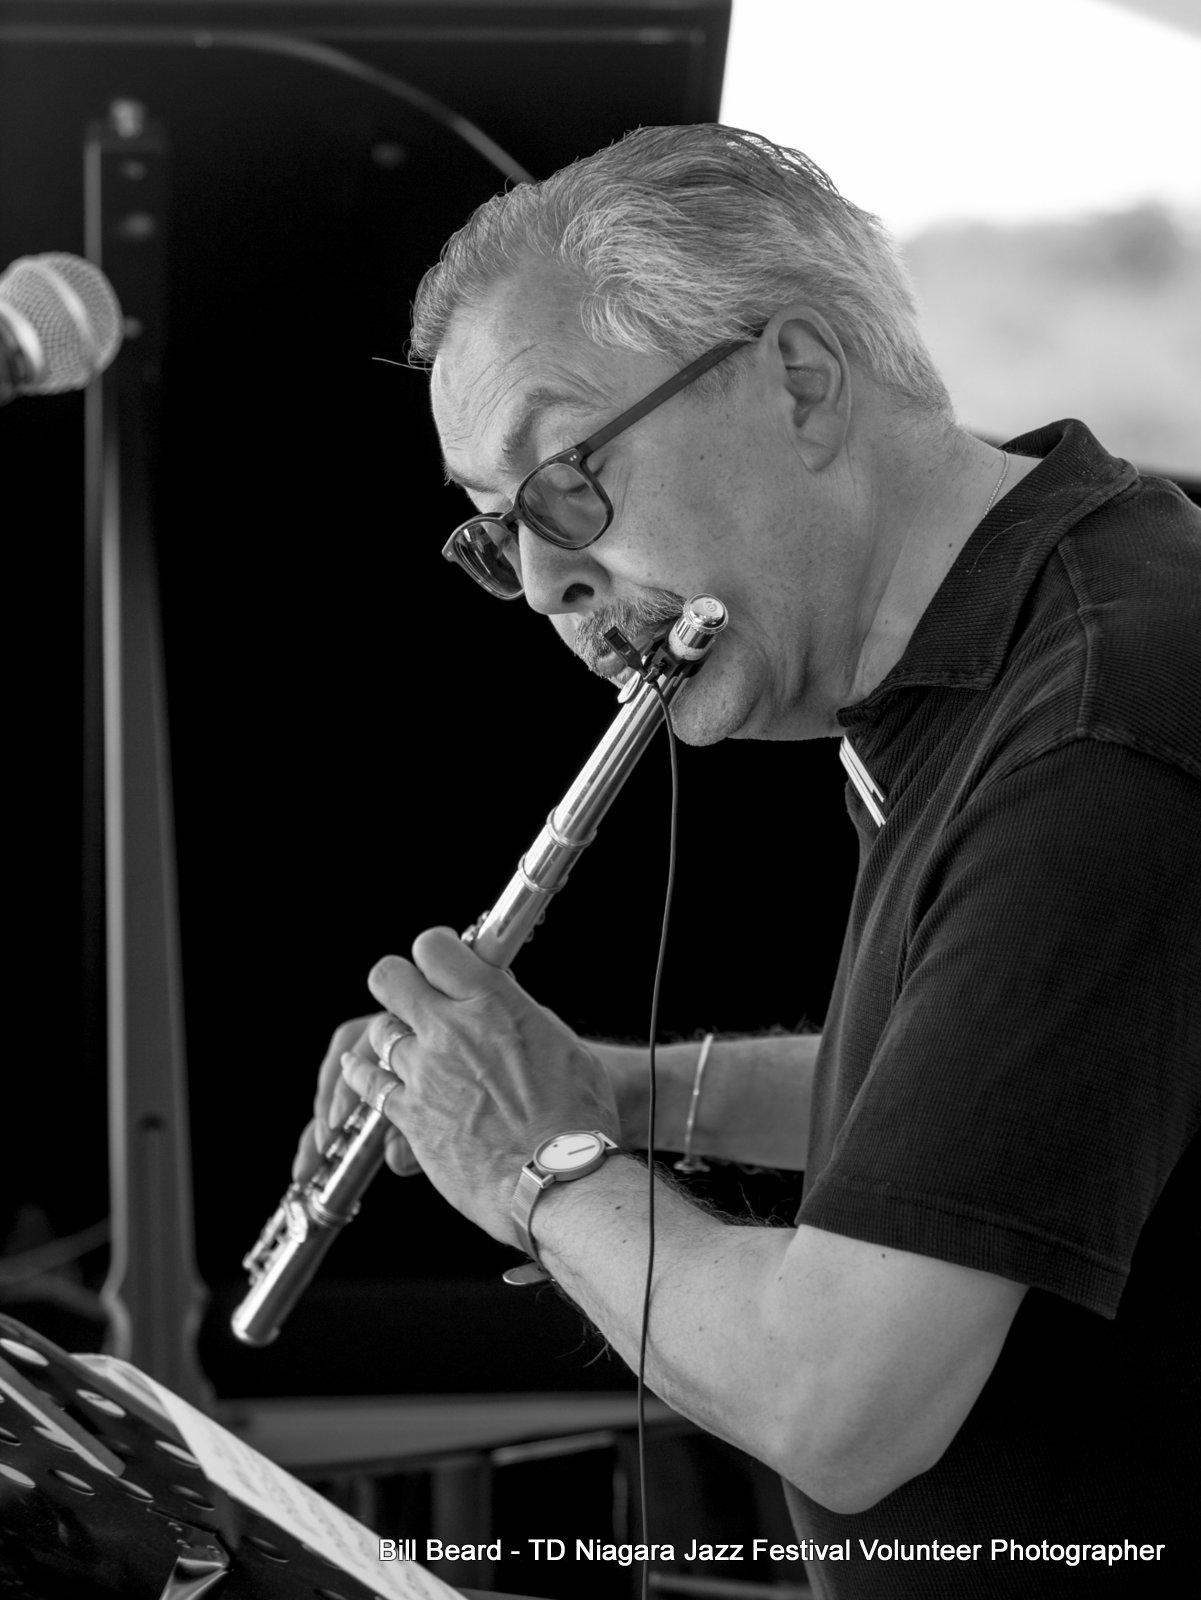 JAZZ on the RISE - Canada 150 Celebration - Megalomaniac Winery - Bill McBirnie (Flute) Sunday, July 30th, 2017. Photo: Bill Beard